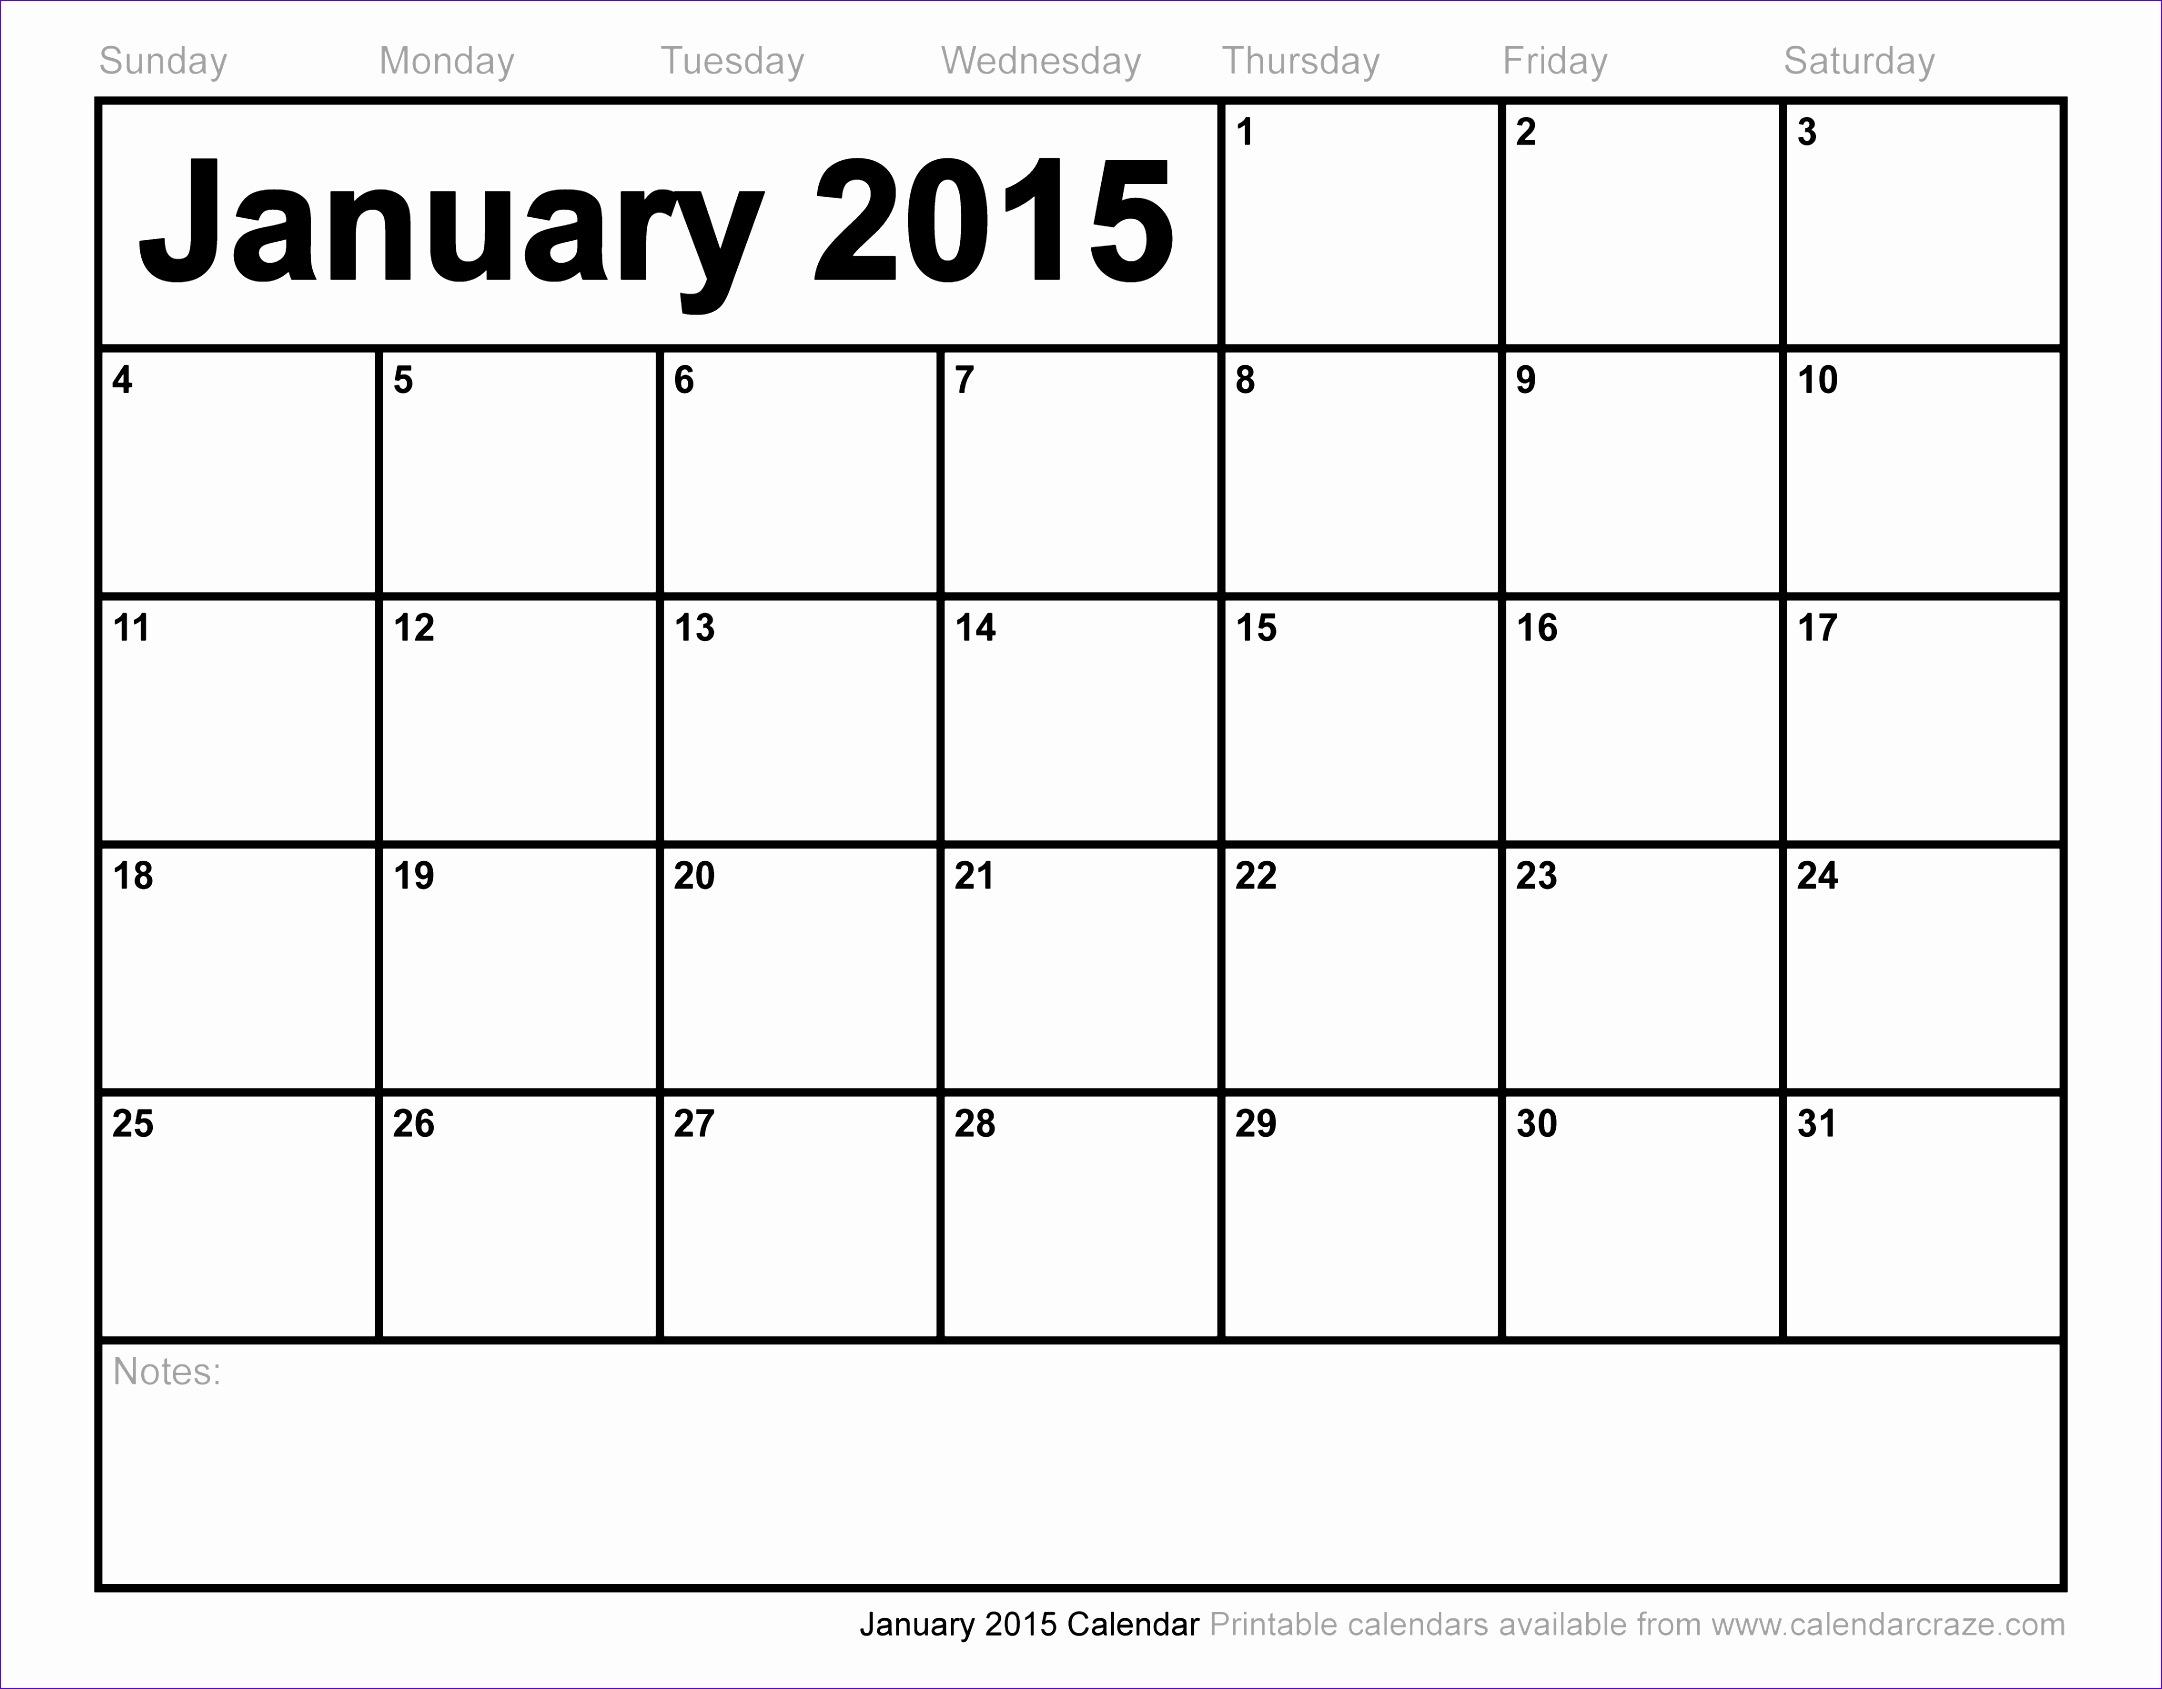 print calendar 2015 free 21621689